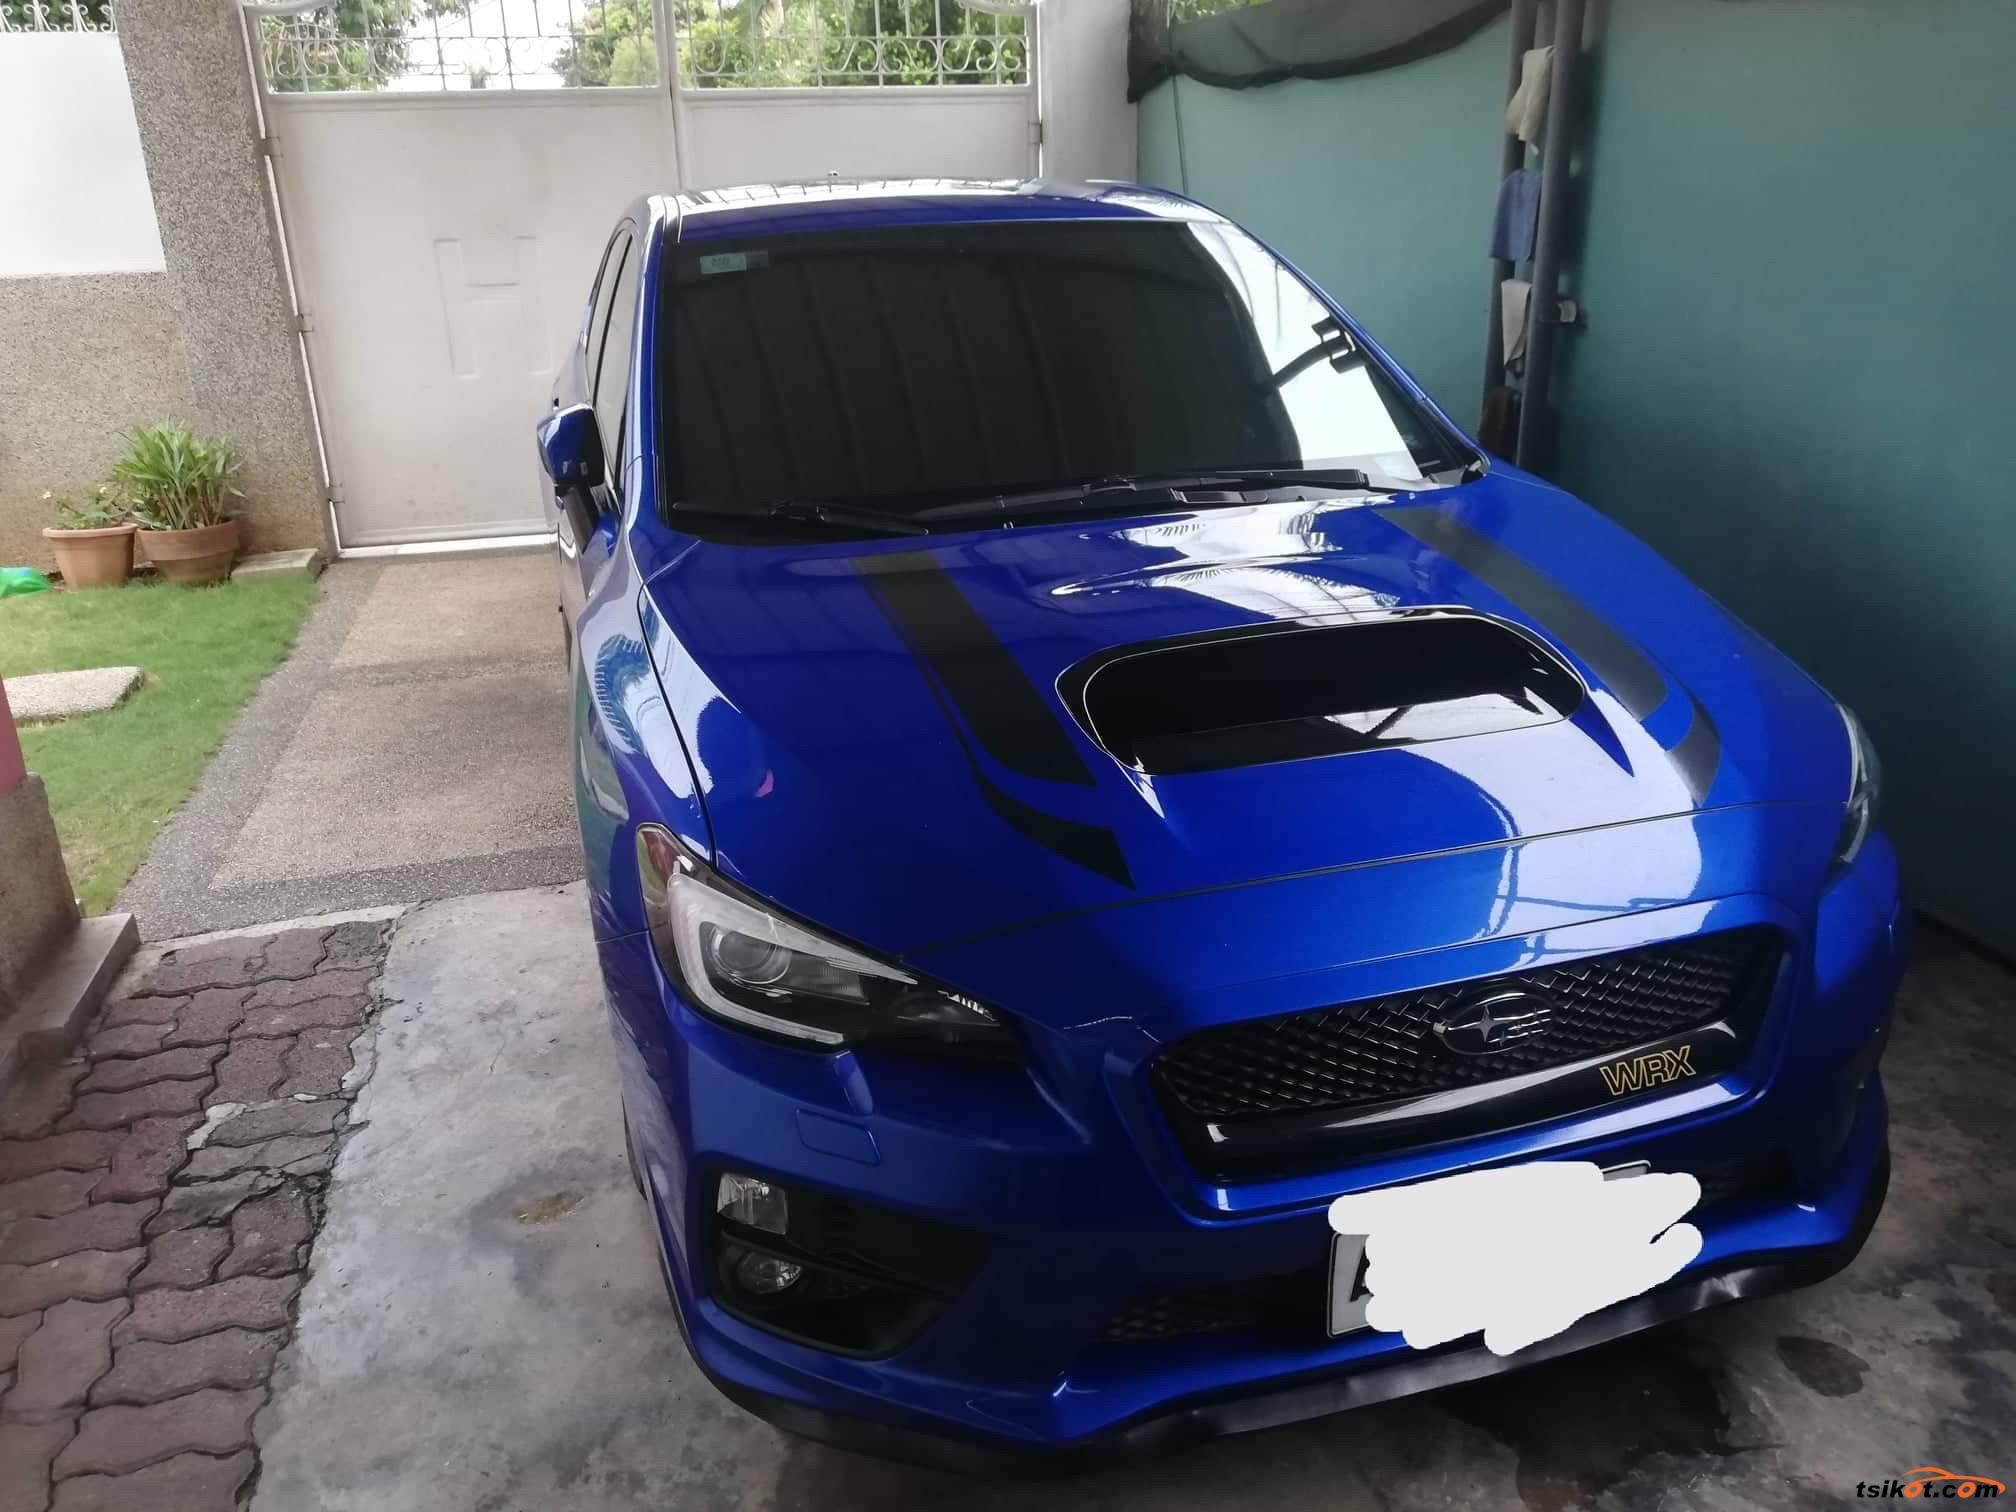 Subaru Wrx 2015 - 2